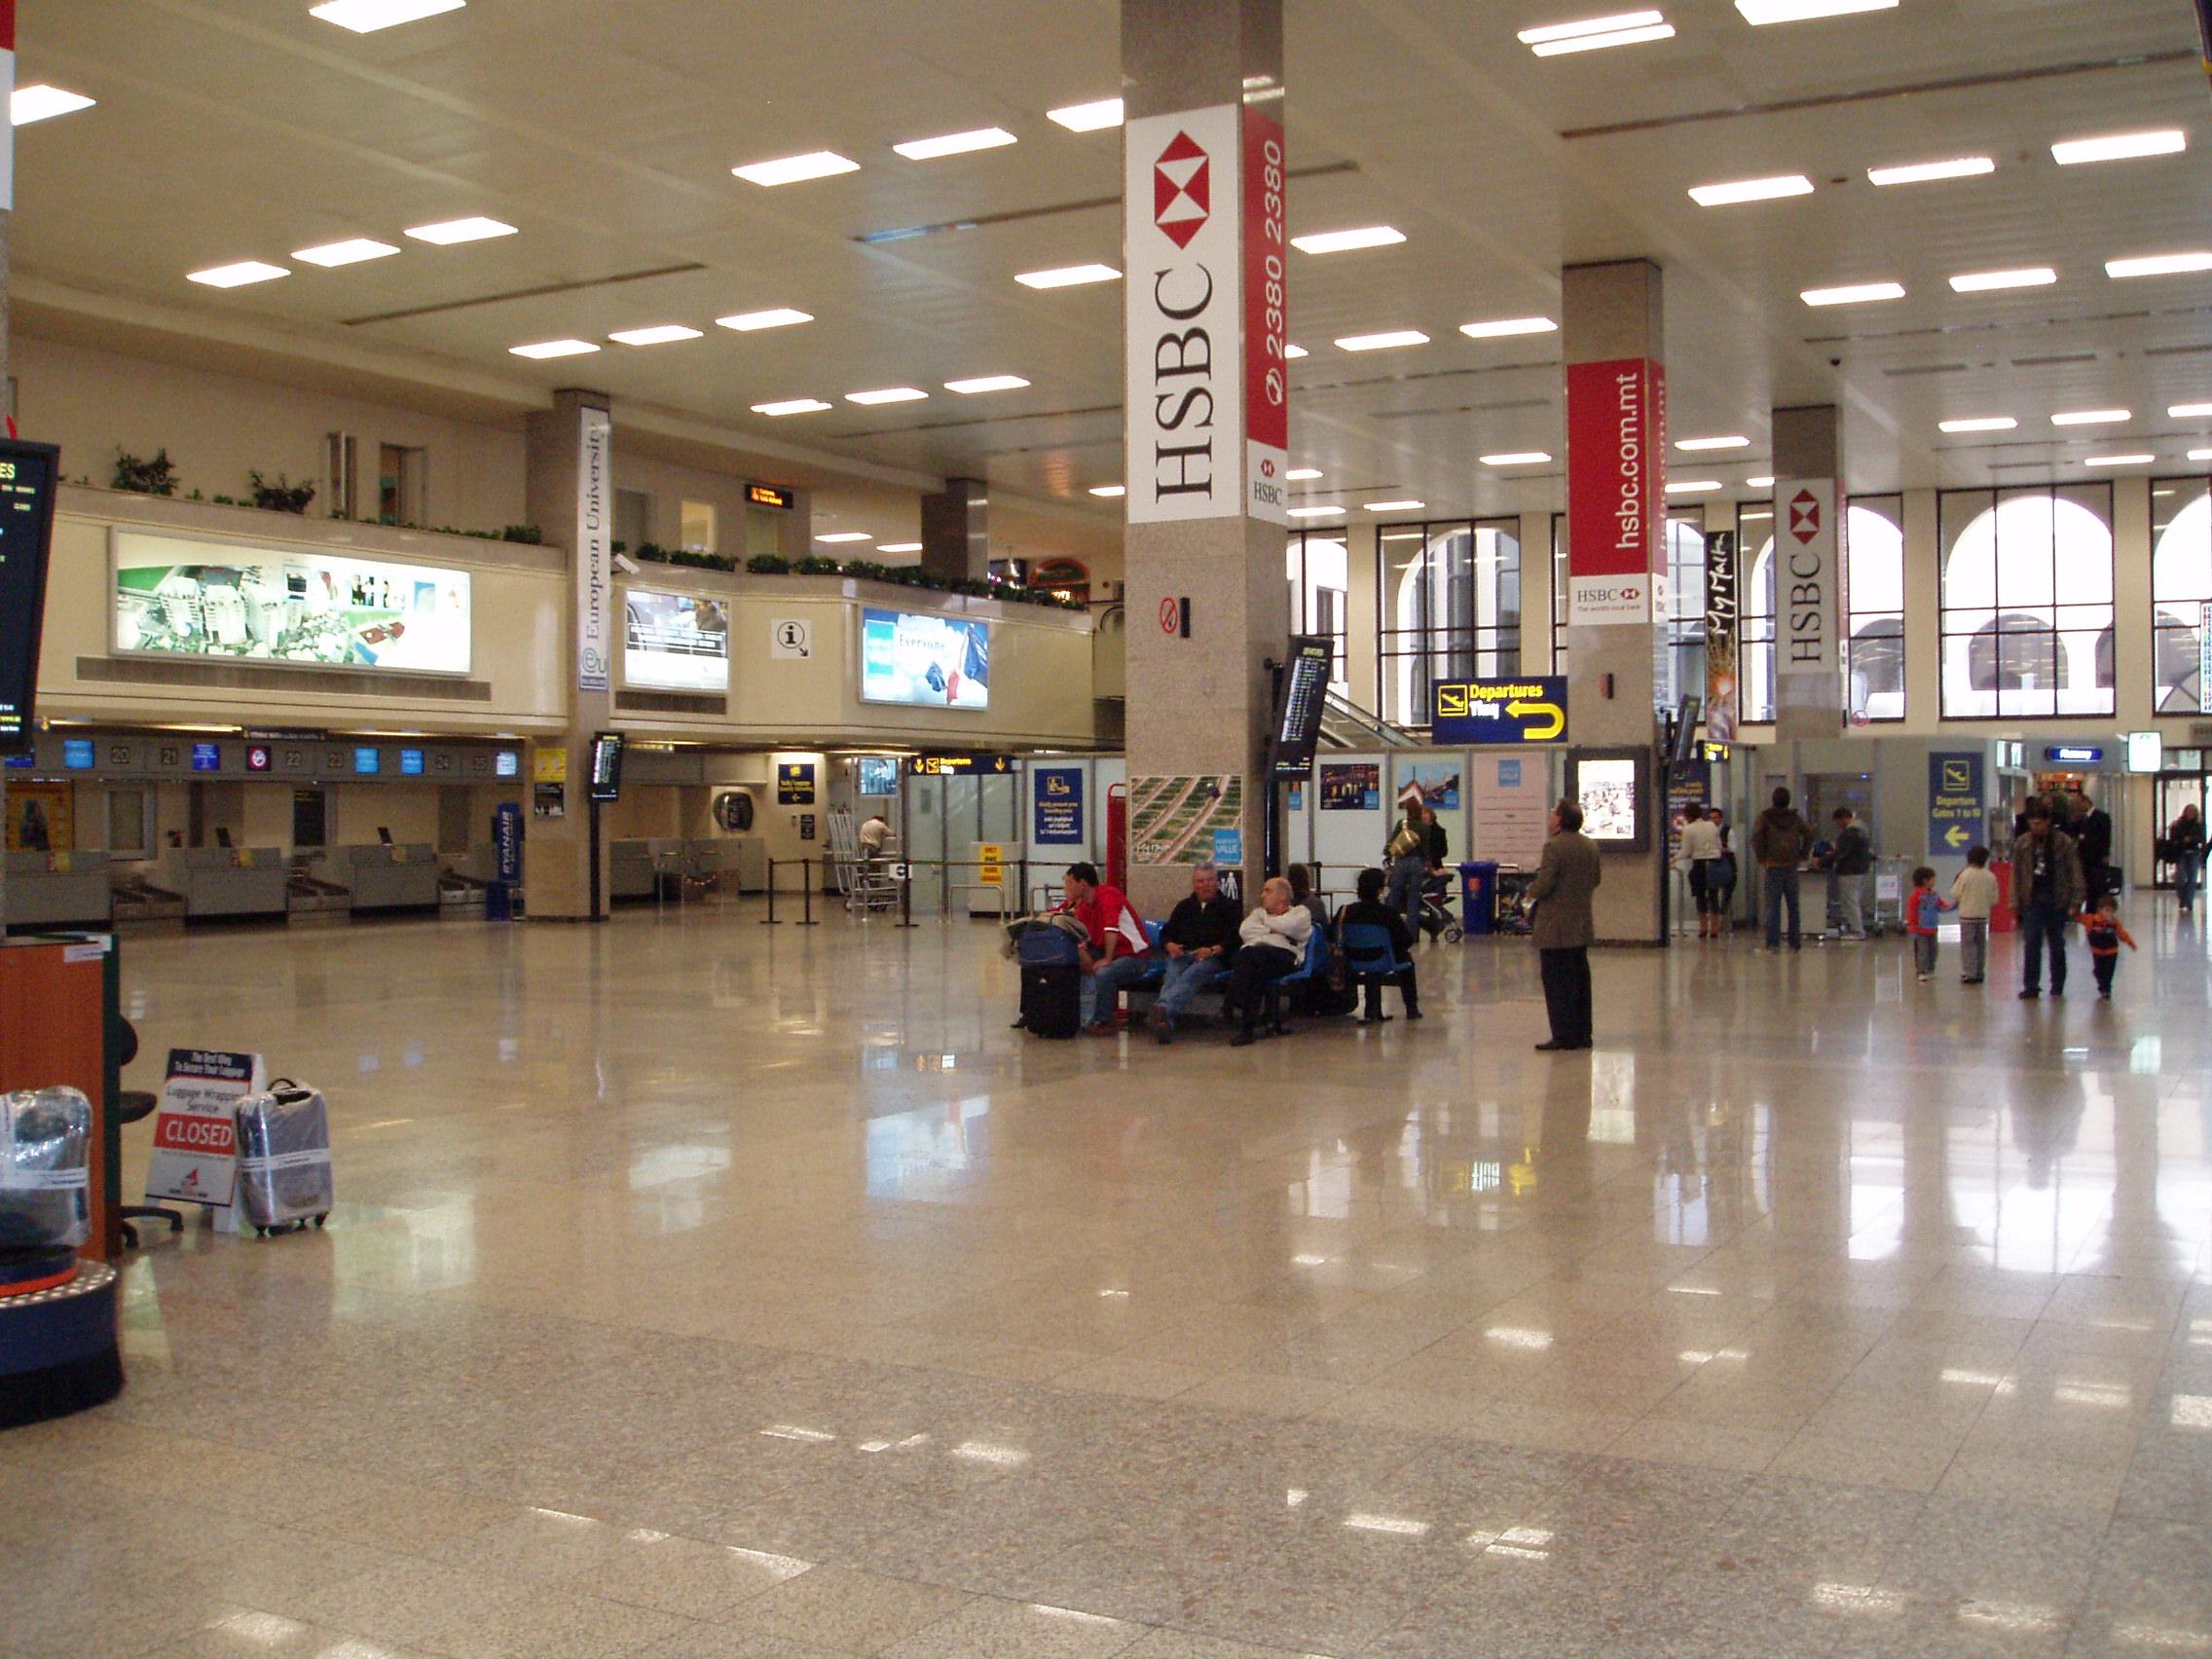 Commons jpg Airport1 File - International malta Wikimedia